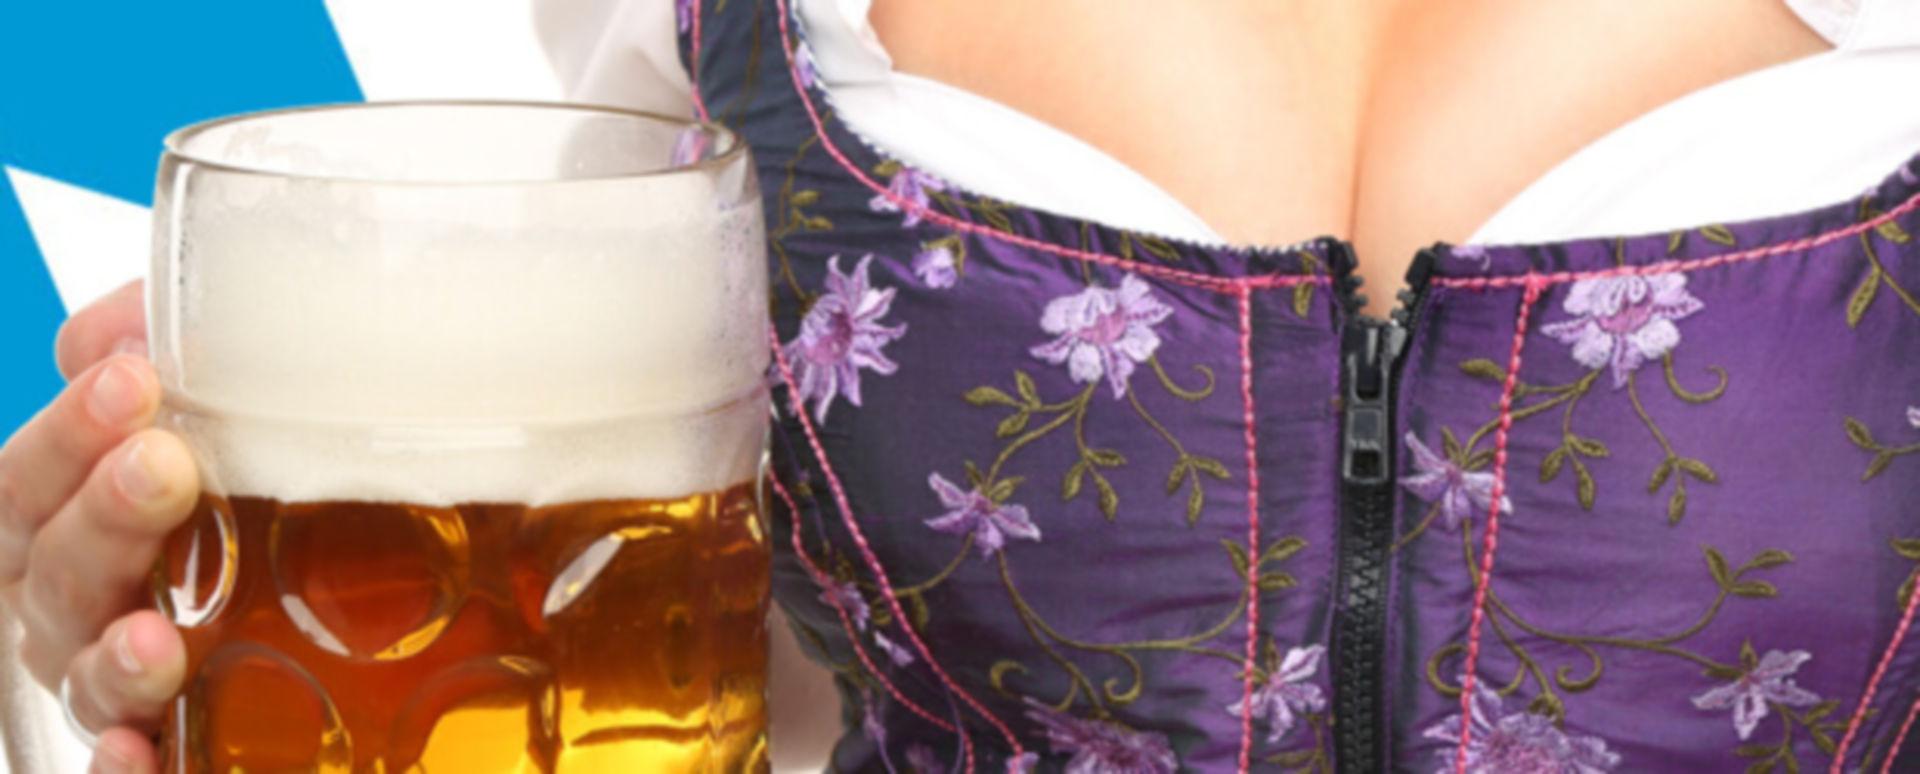 Brust bier östrogen Expander: Vergrößert